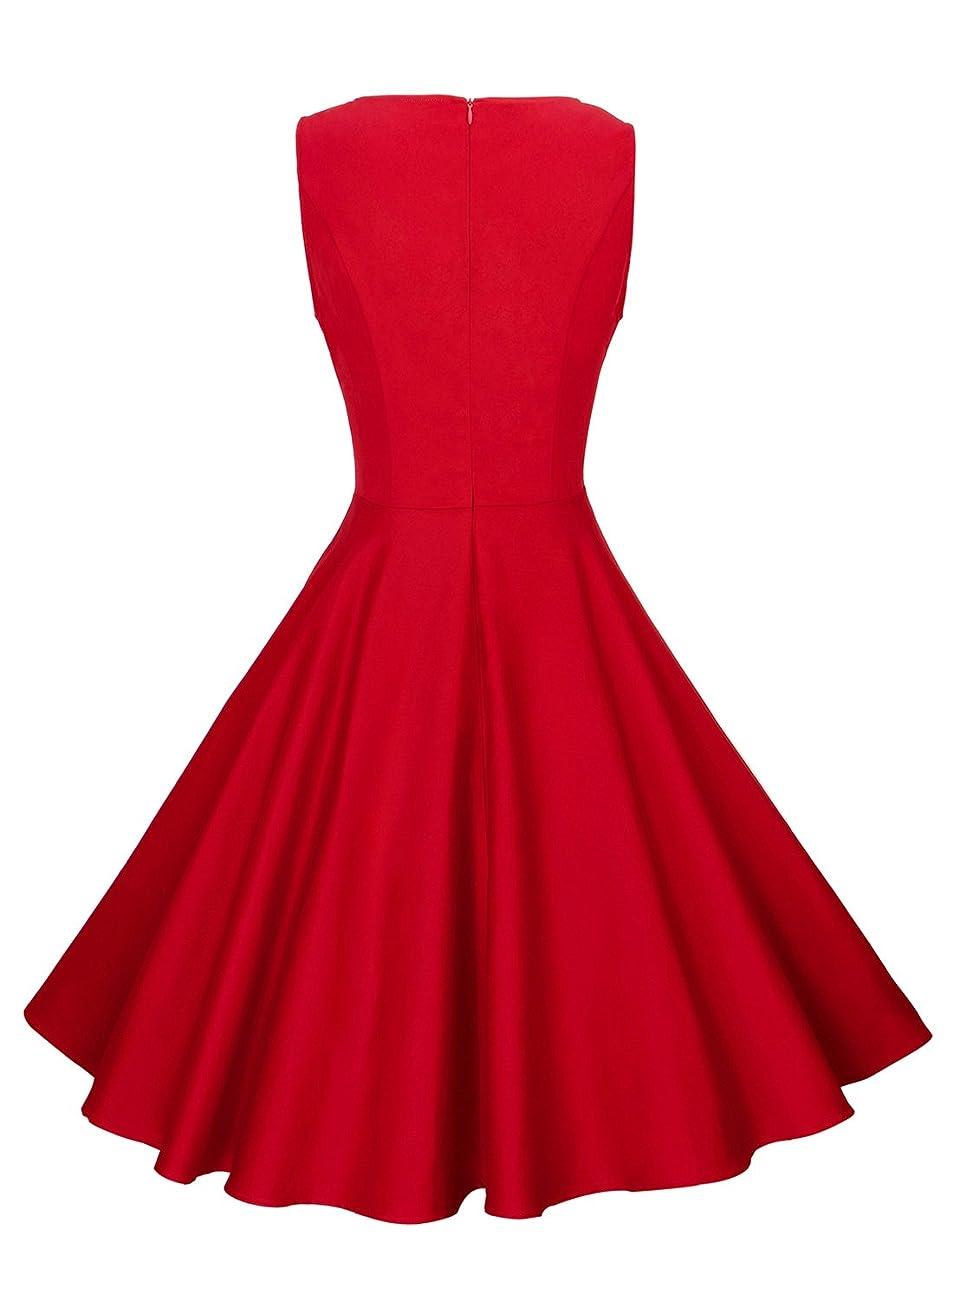 Anni Coco Women's Classy Audrey Hepburn 1950s Vintage Rockabilly Swing Dress 2